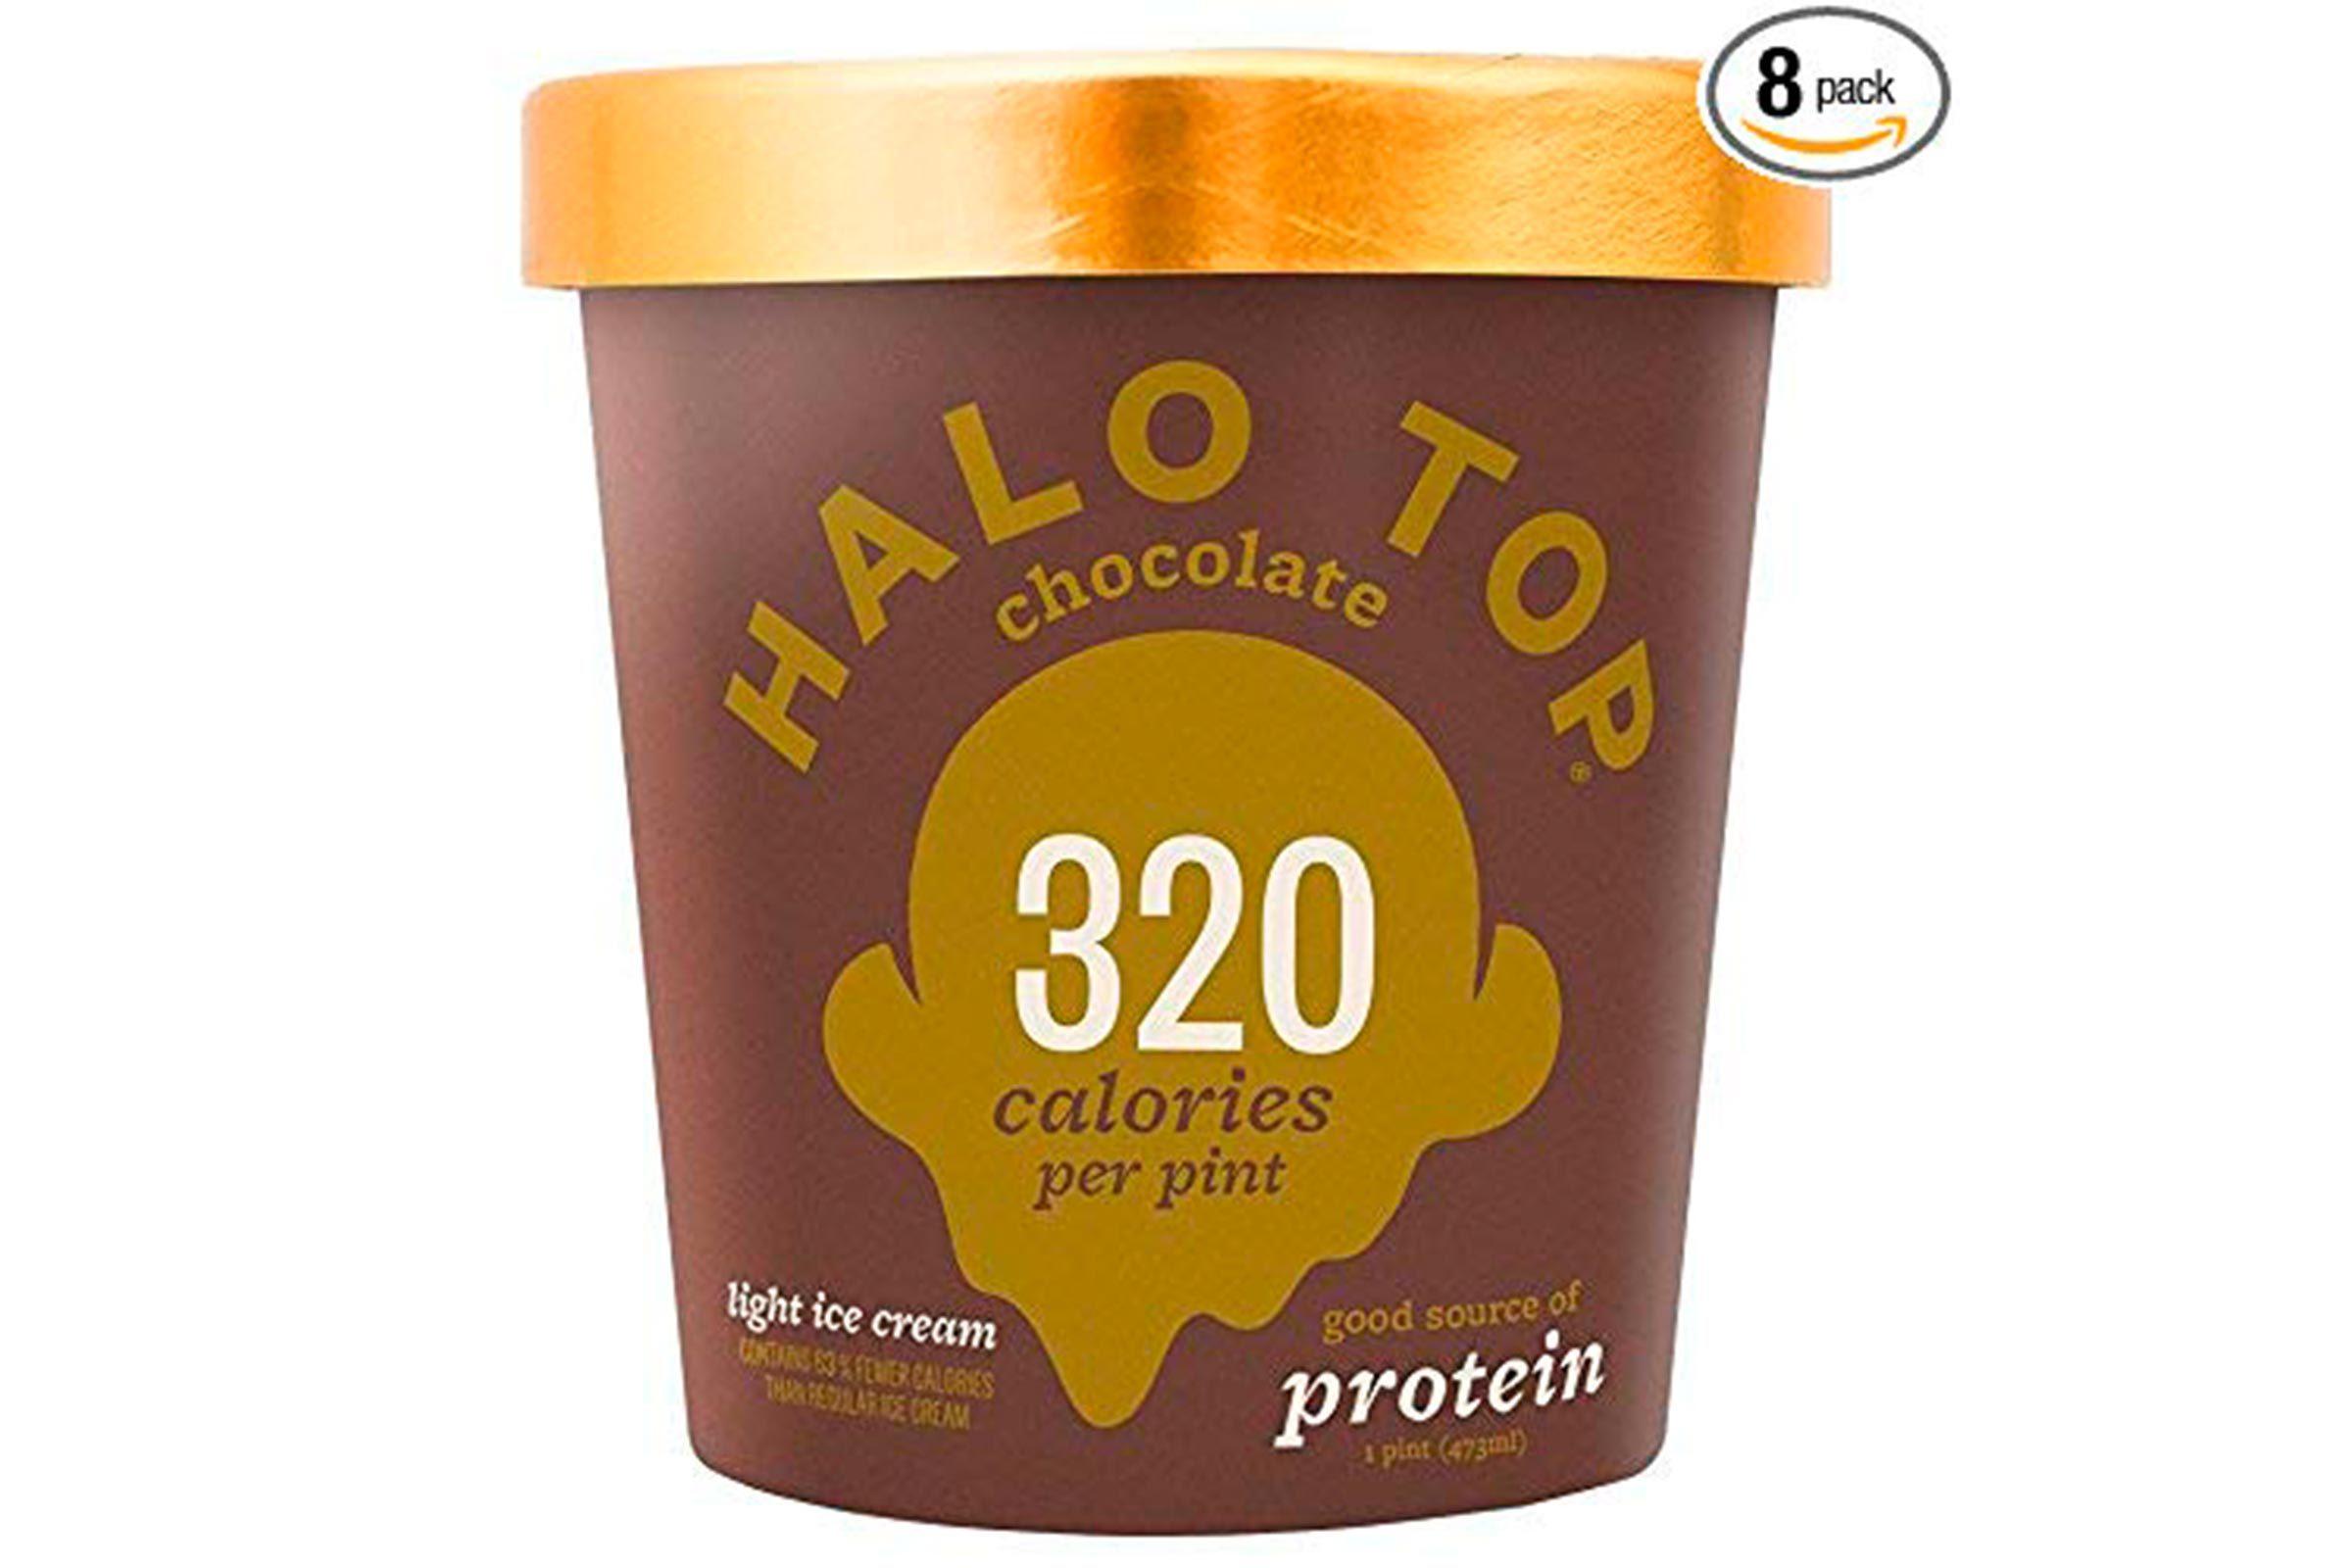 Halo ice cream